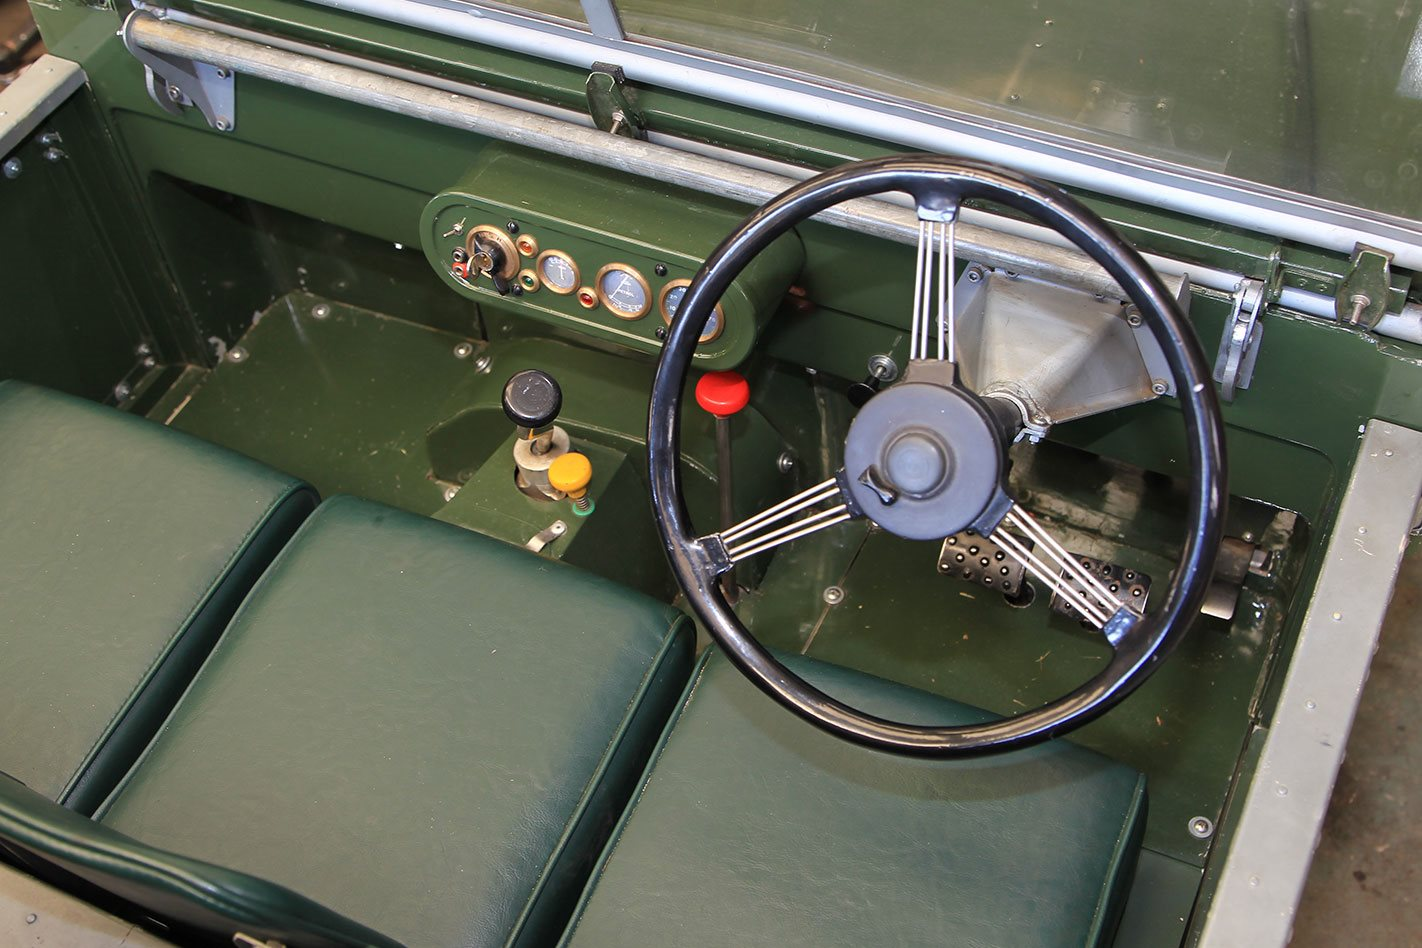 custom today landrover build exterior rover design ecd your dashboard superior defender automotive land